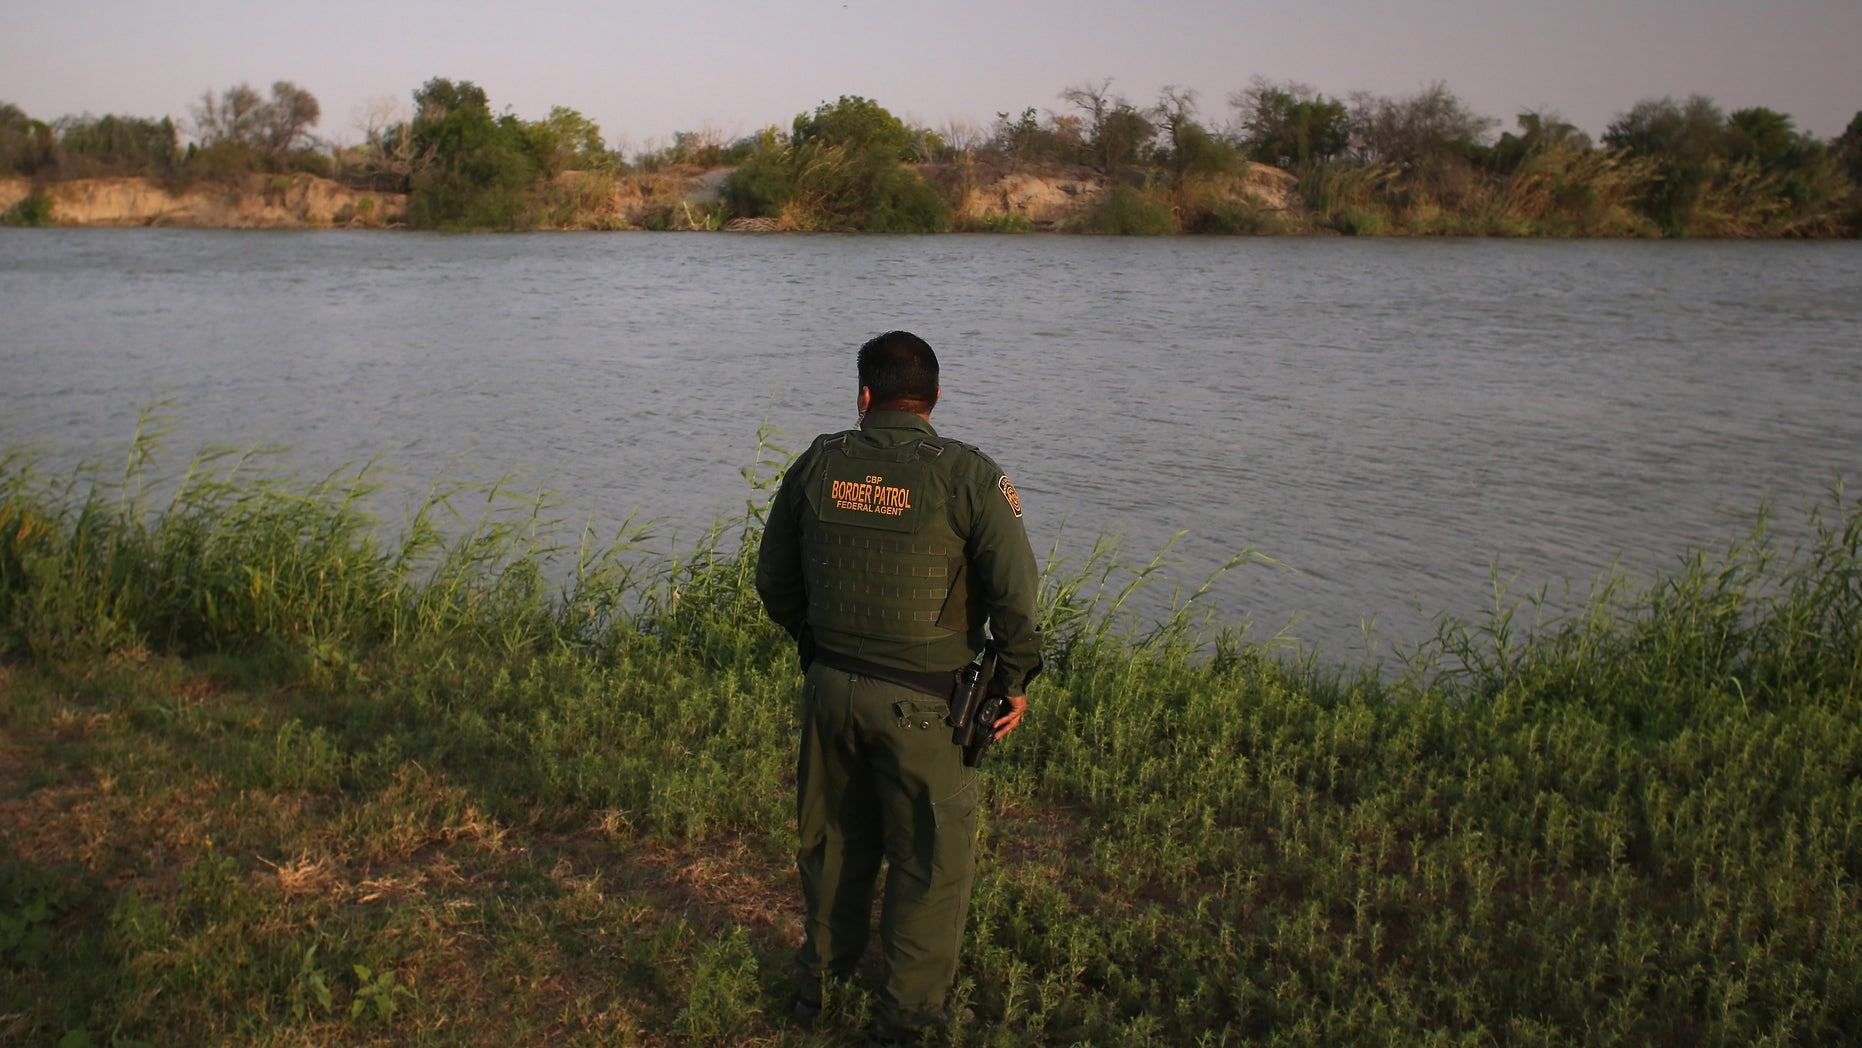 MCALLEN, TX - APRIL 10:  U.S. Border Patrol agent Sal De Leon looks across the Rio Grande River into Mexico at the U.S.-Mexico border while on patrol on April 10, 2013 in McAllen, Texas.  (Photo by John Moore/Getty Images)